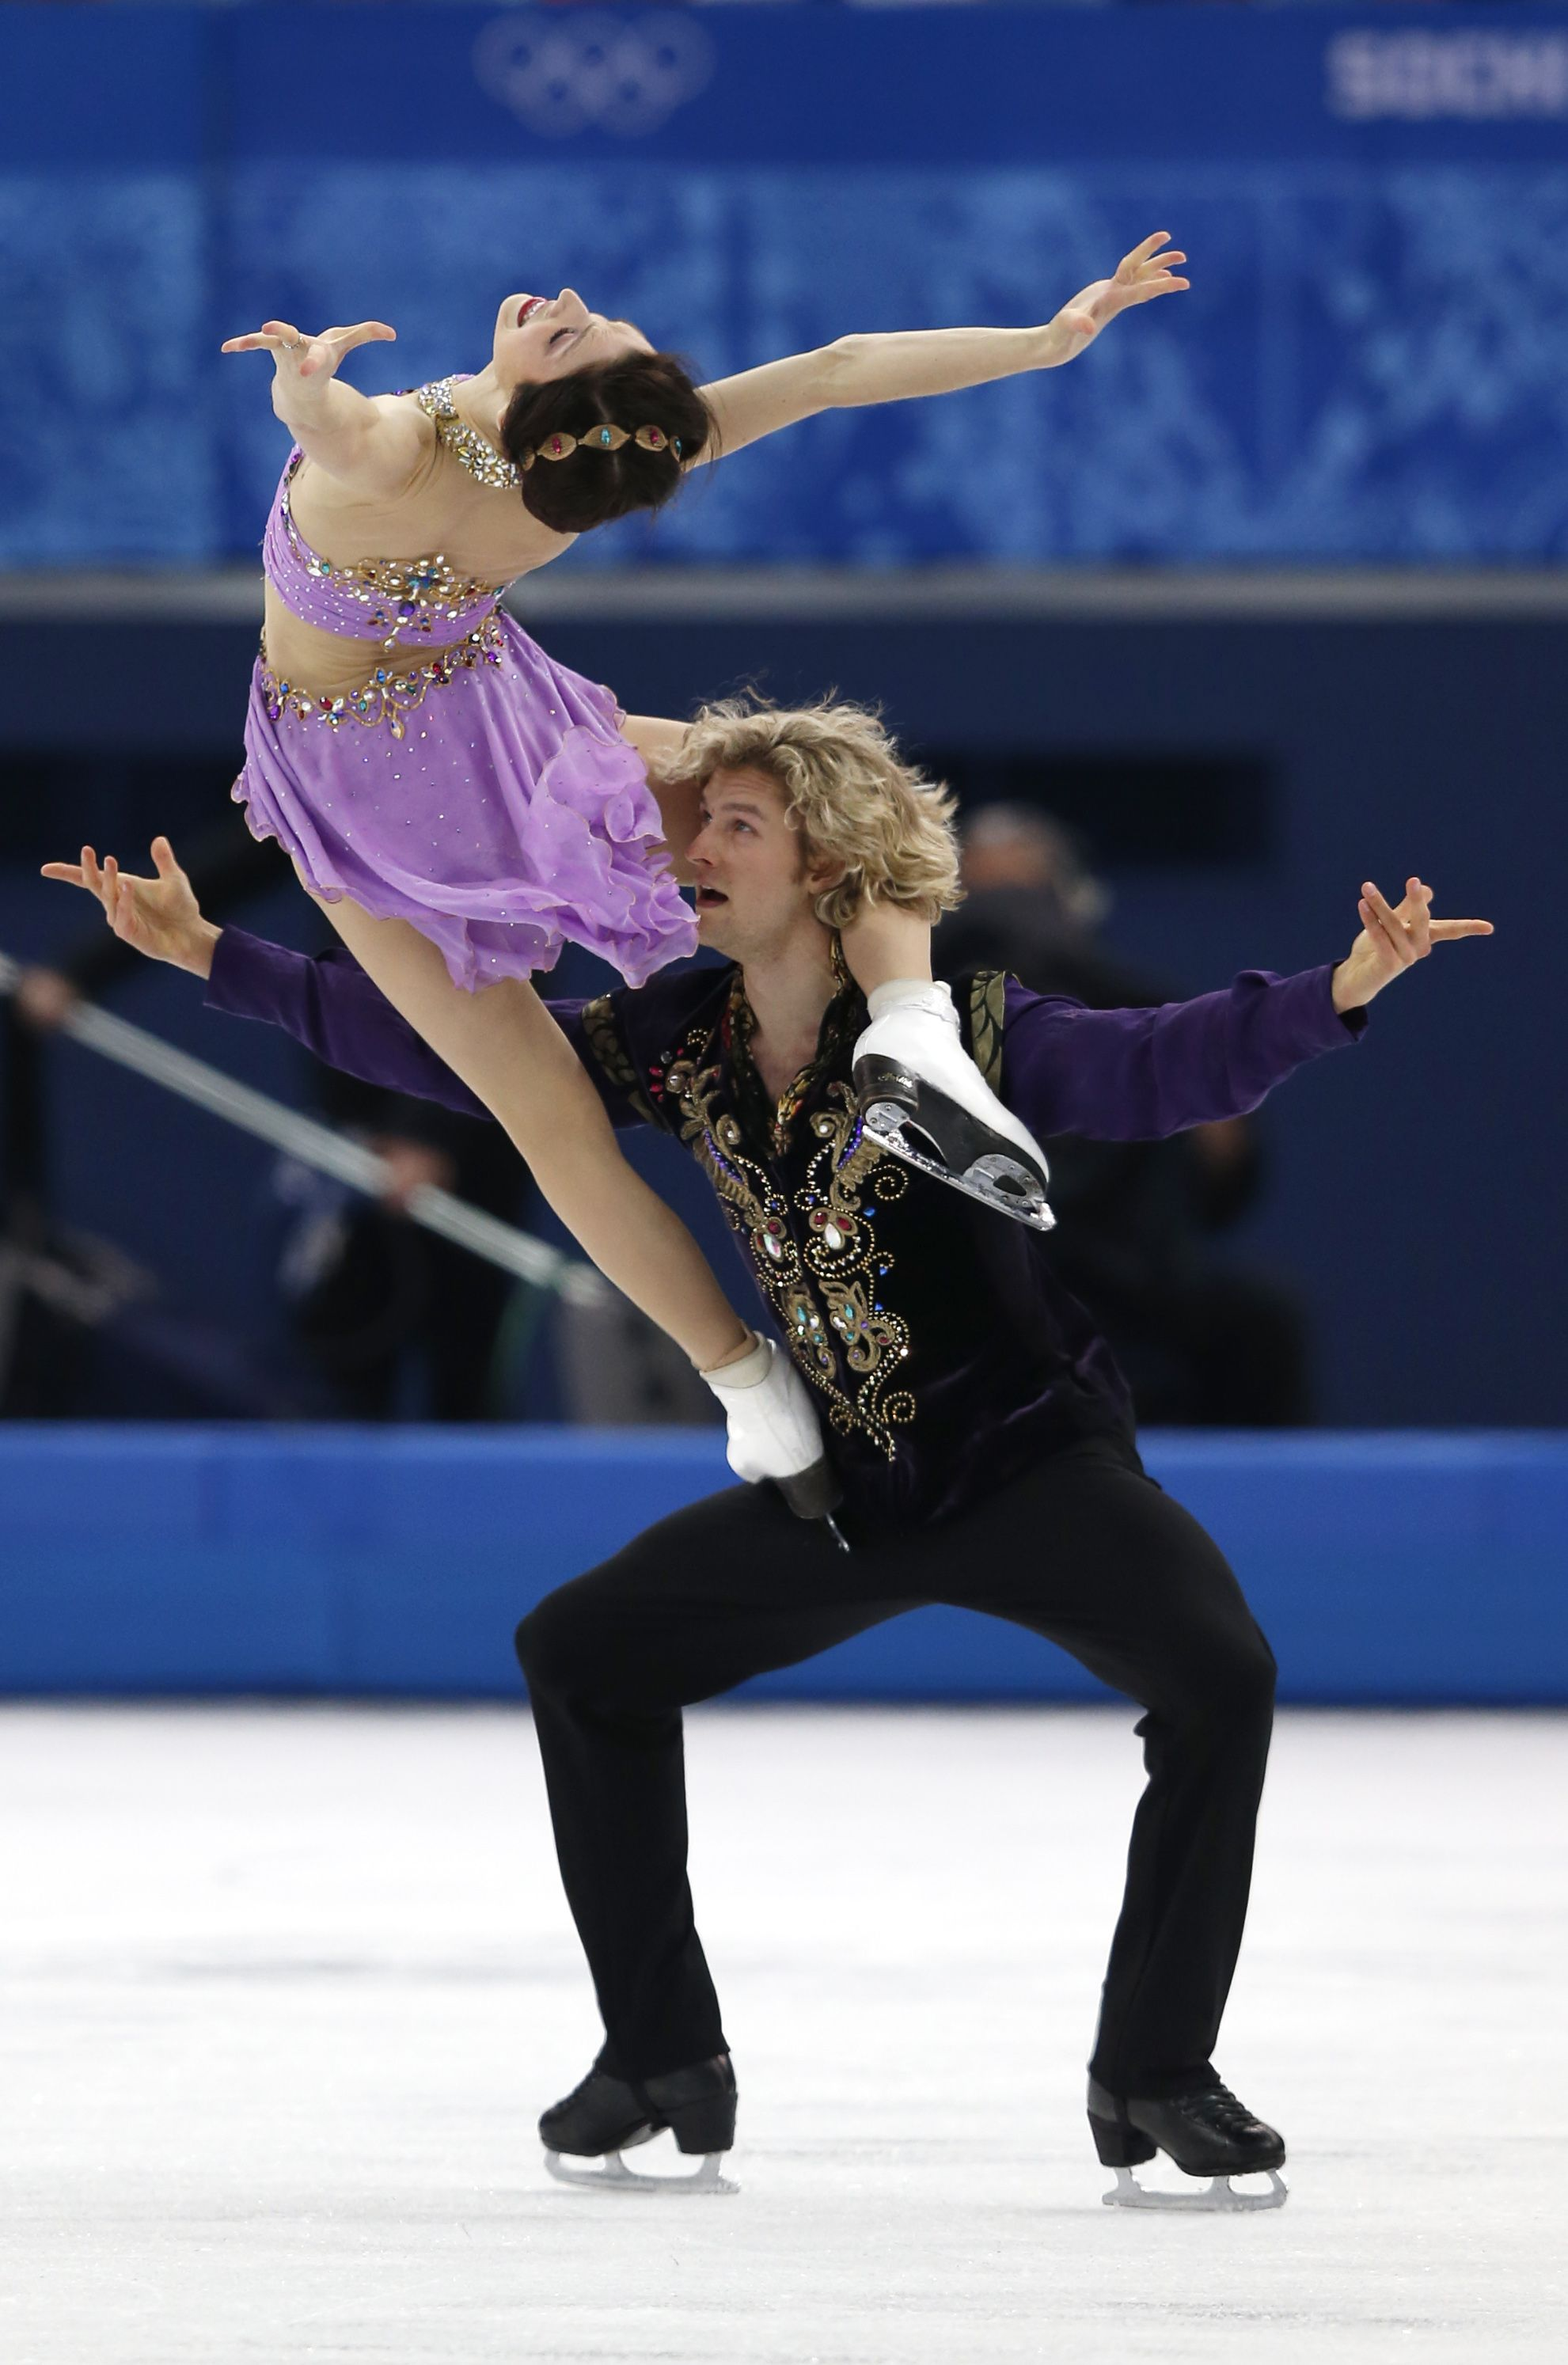 Meryl Davis and Charlie White won gold in 2014 in Sochi